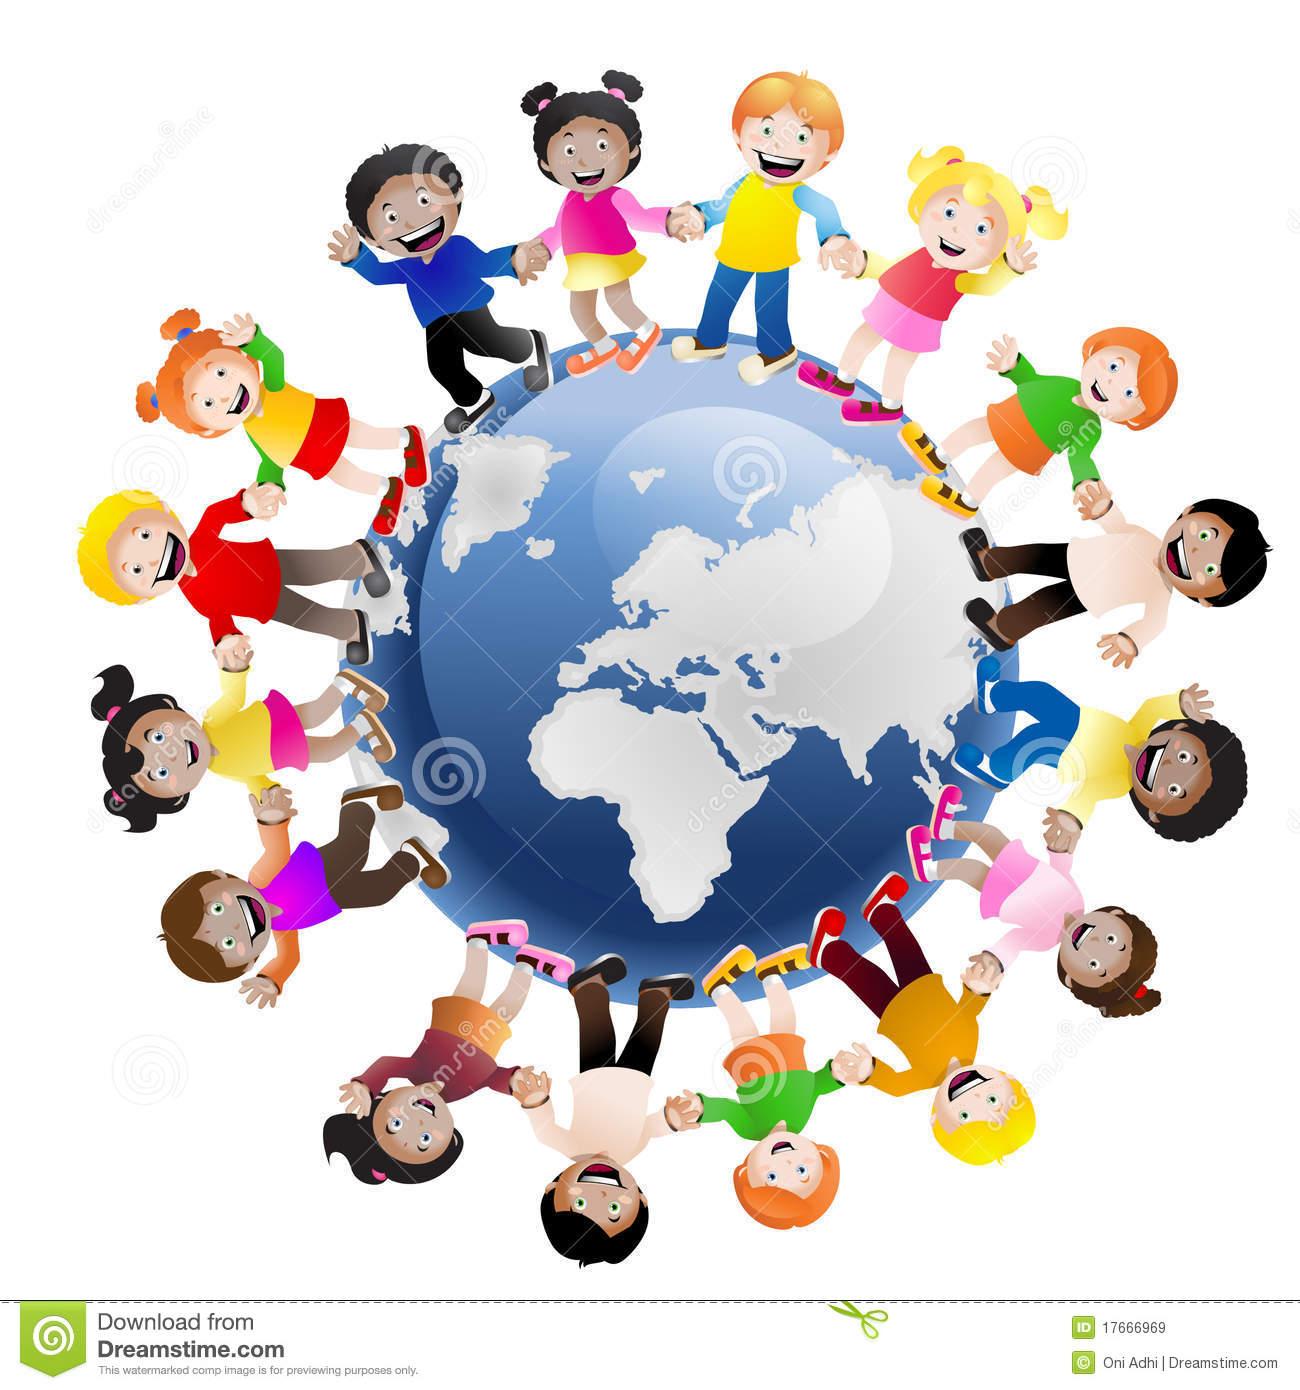 Kids Holding Hands Around The World Clipart.